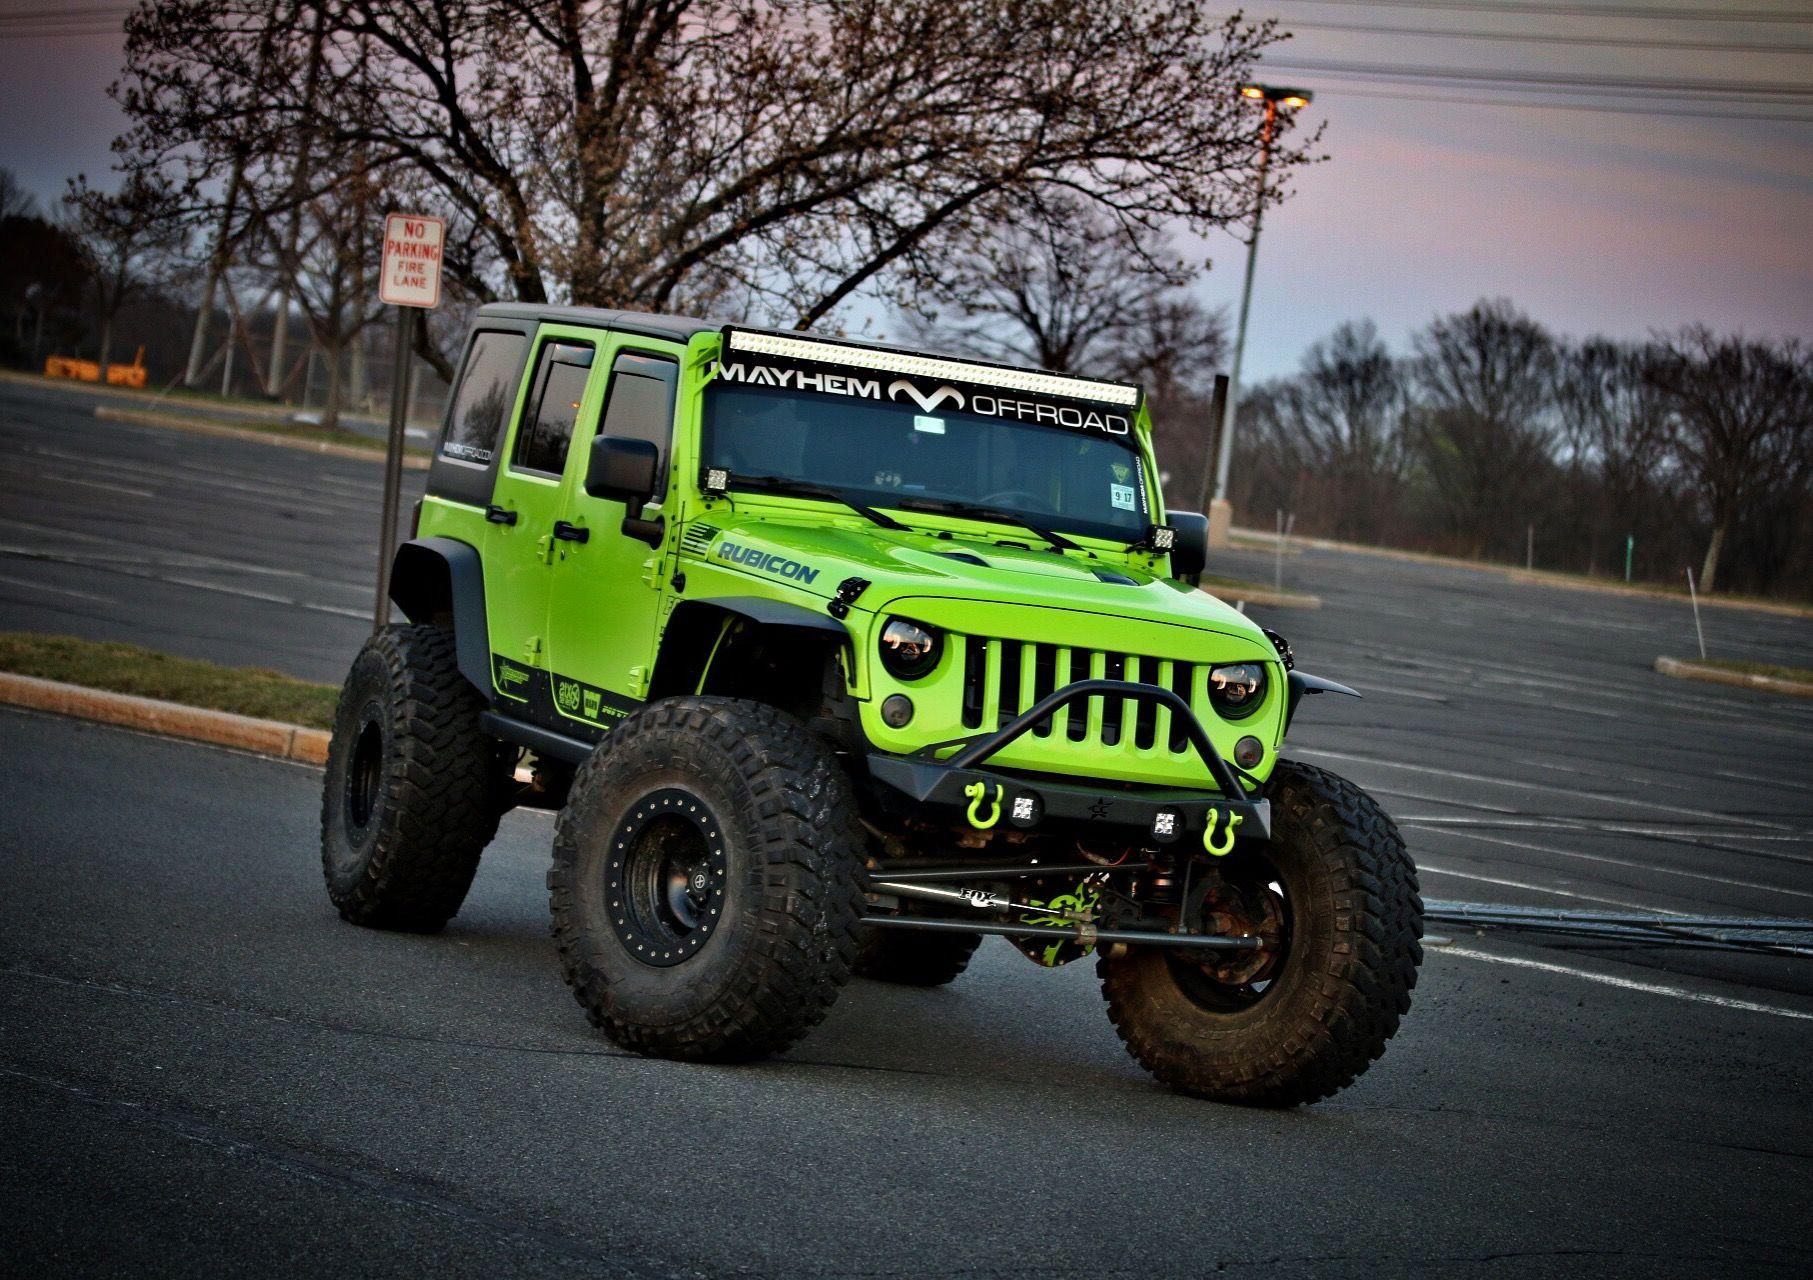 gecko green Jeep Jk feat our NightHawk Light Brow... Looks